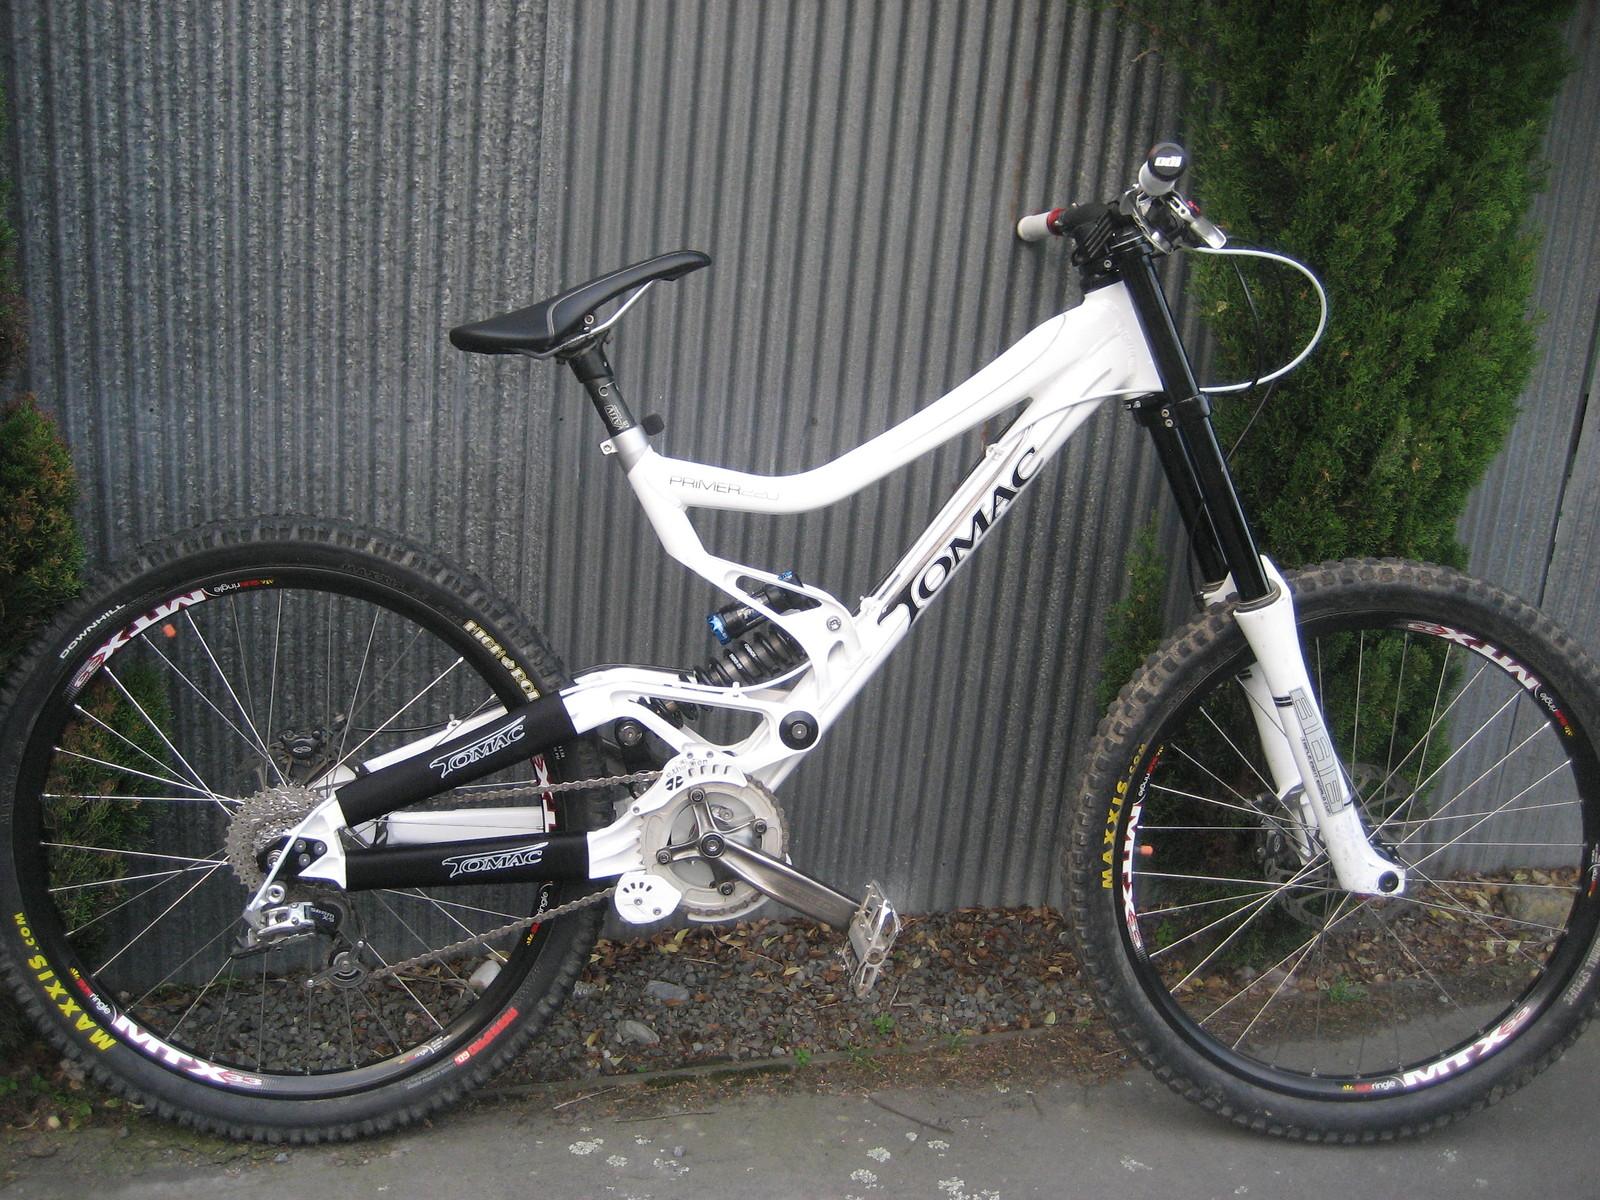 My new sponsor bike